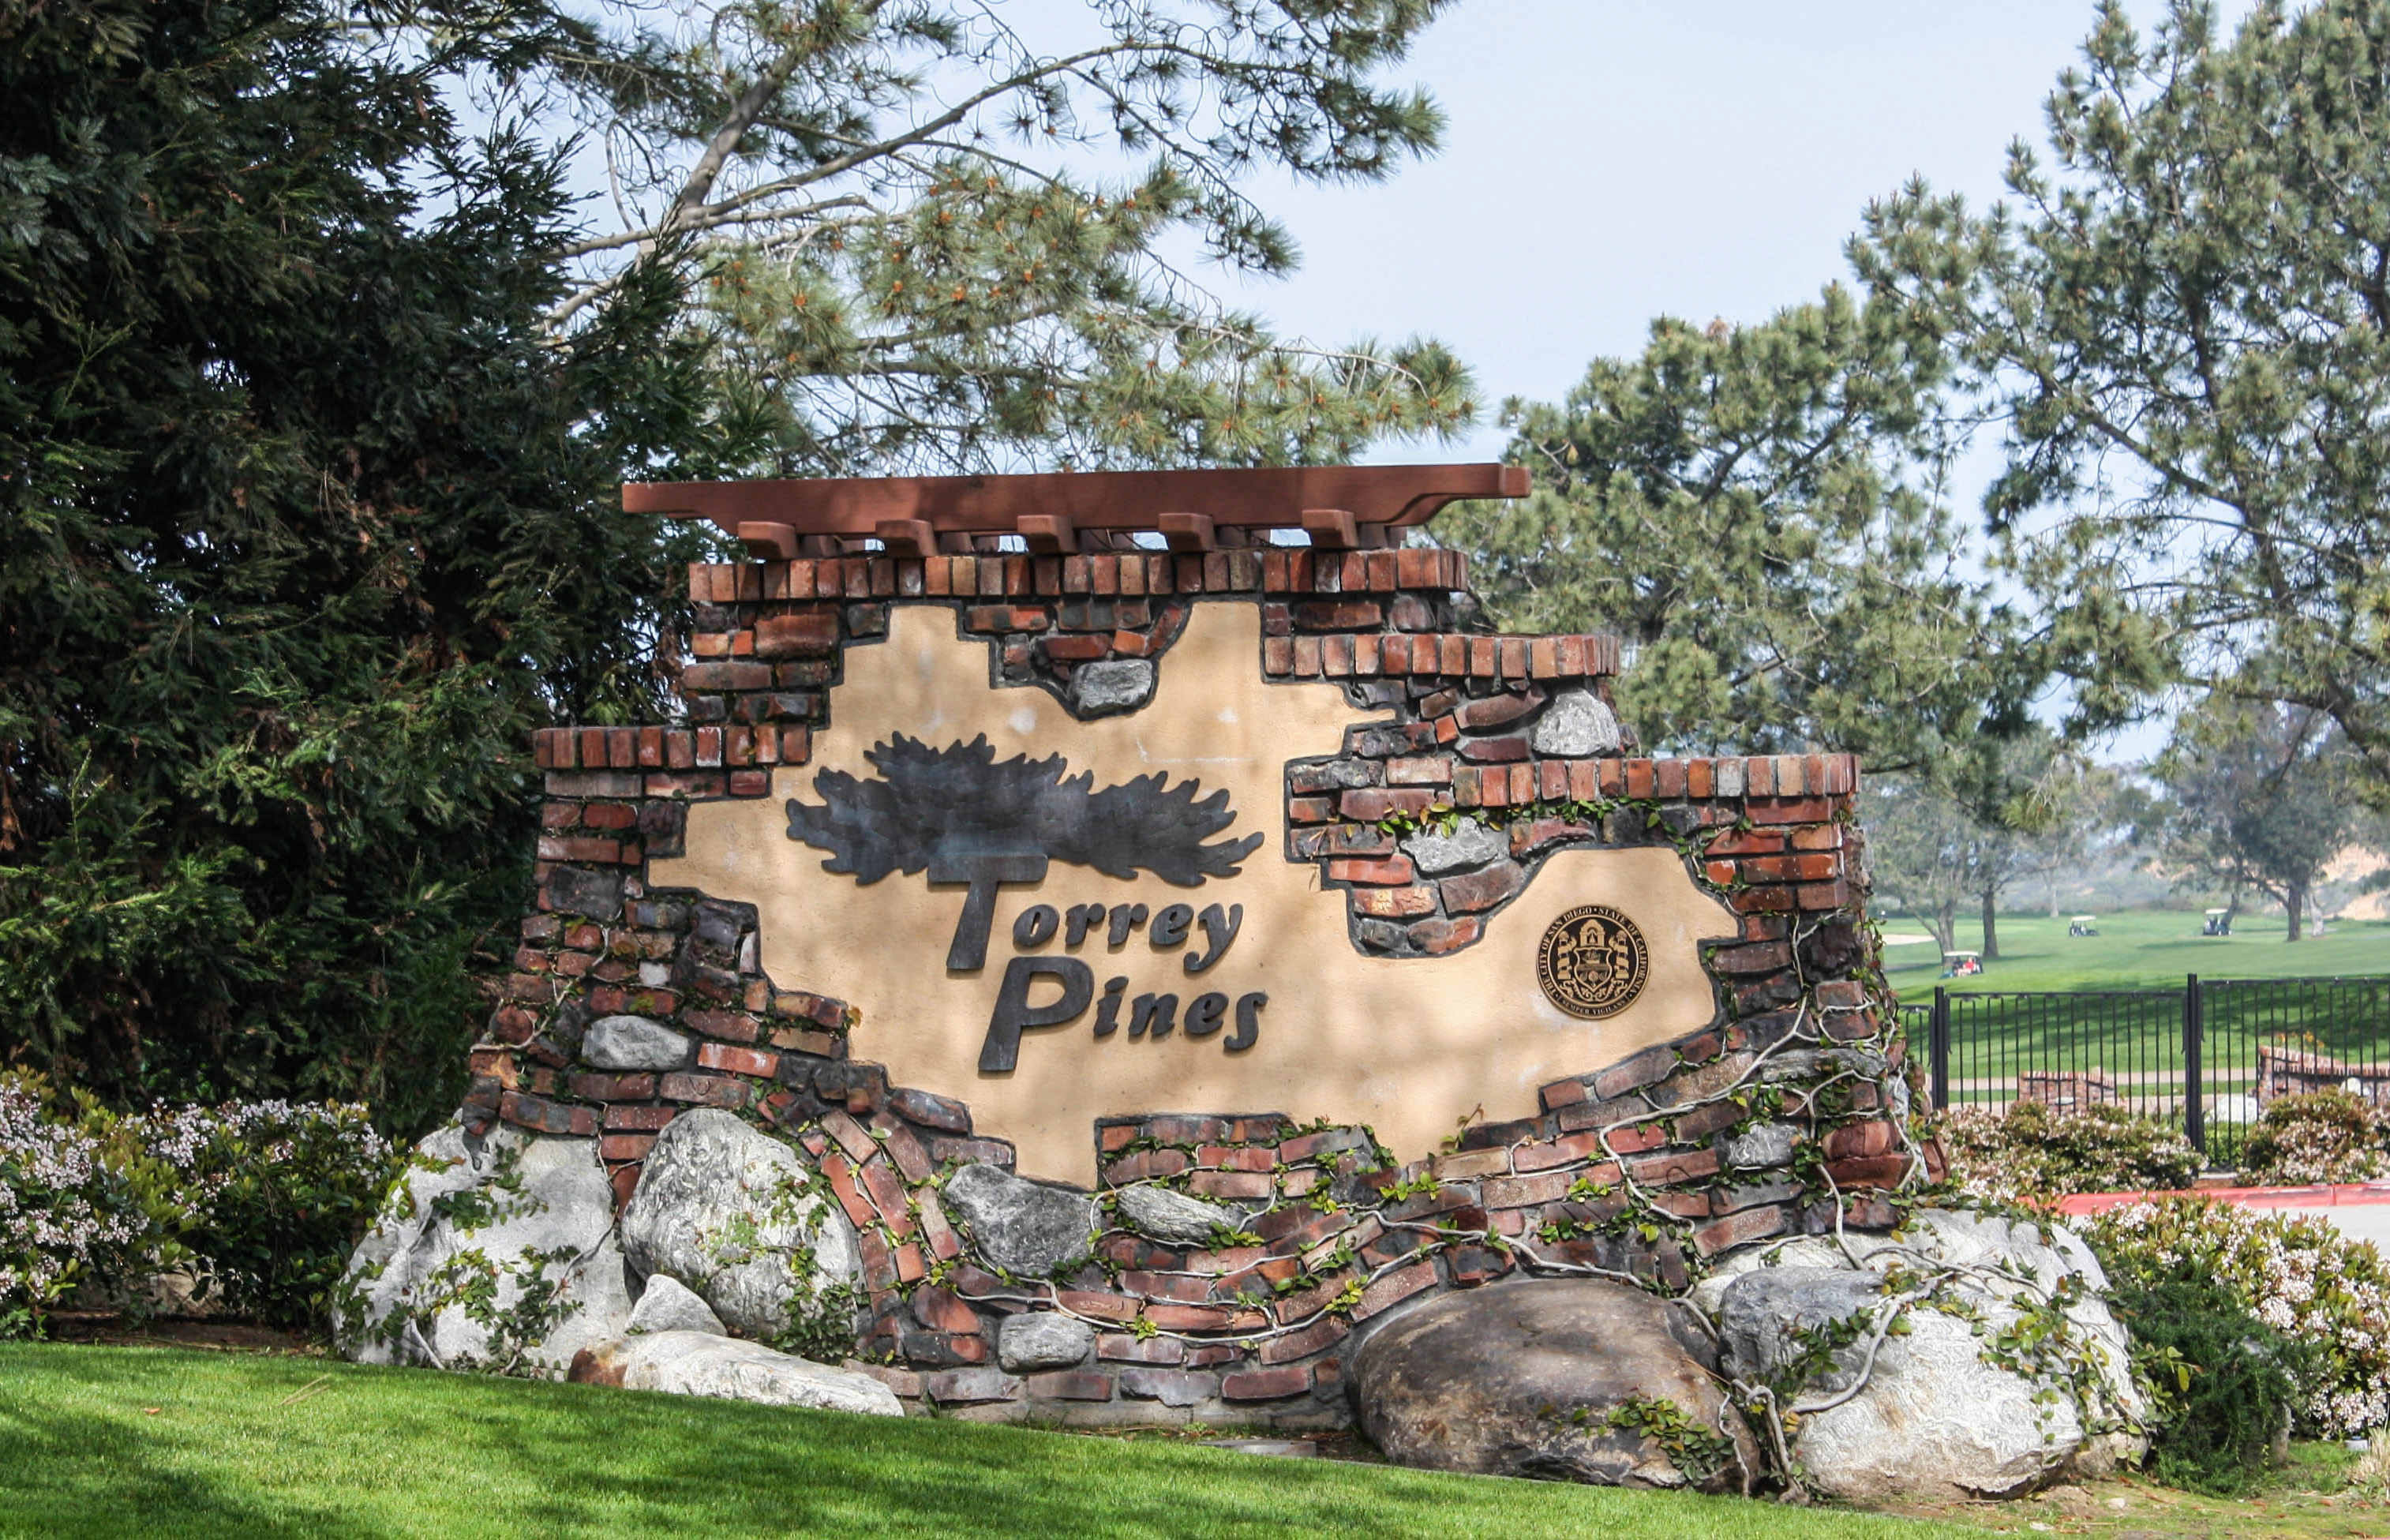 a57c7bfa74 Torrey Pines Golf Course - Wikipedia